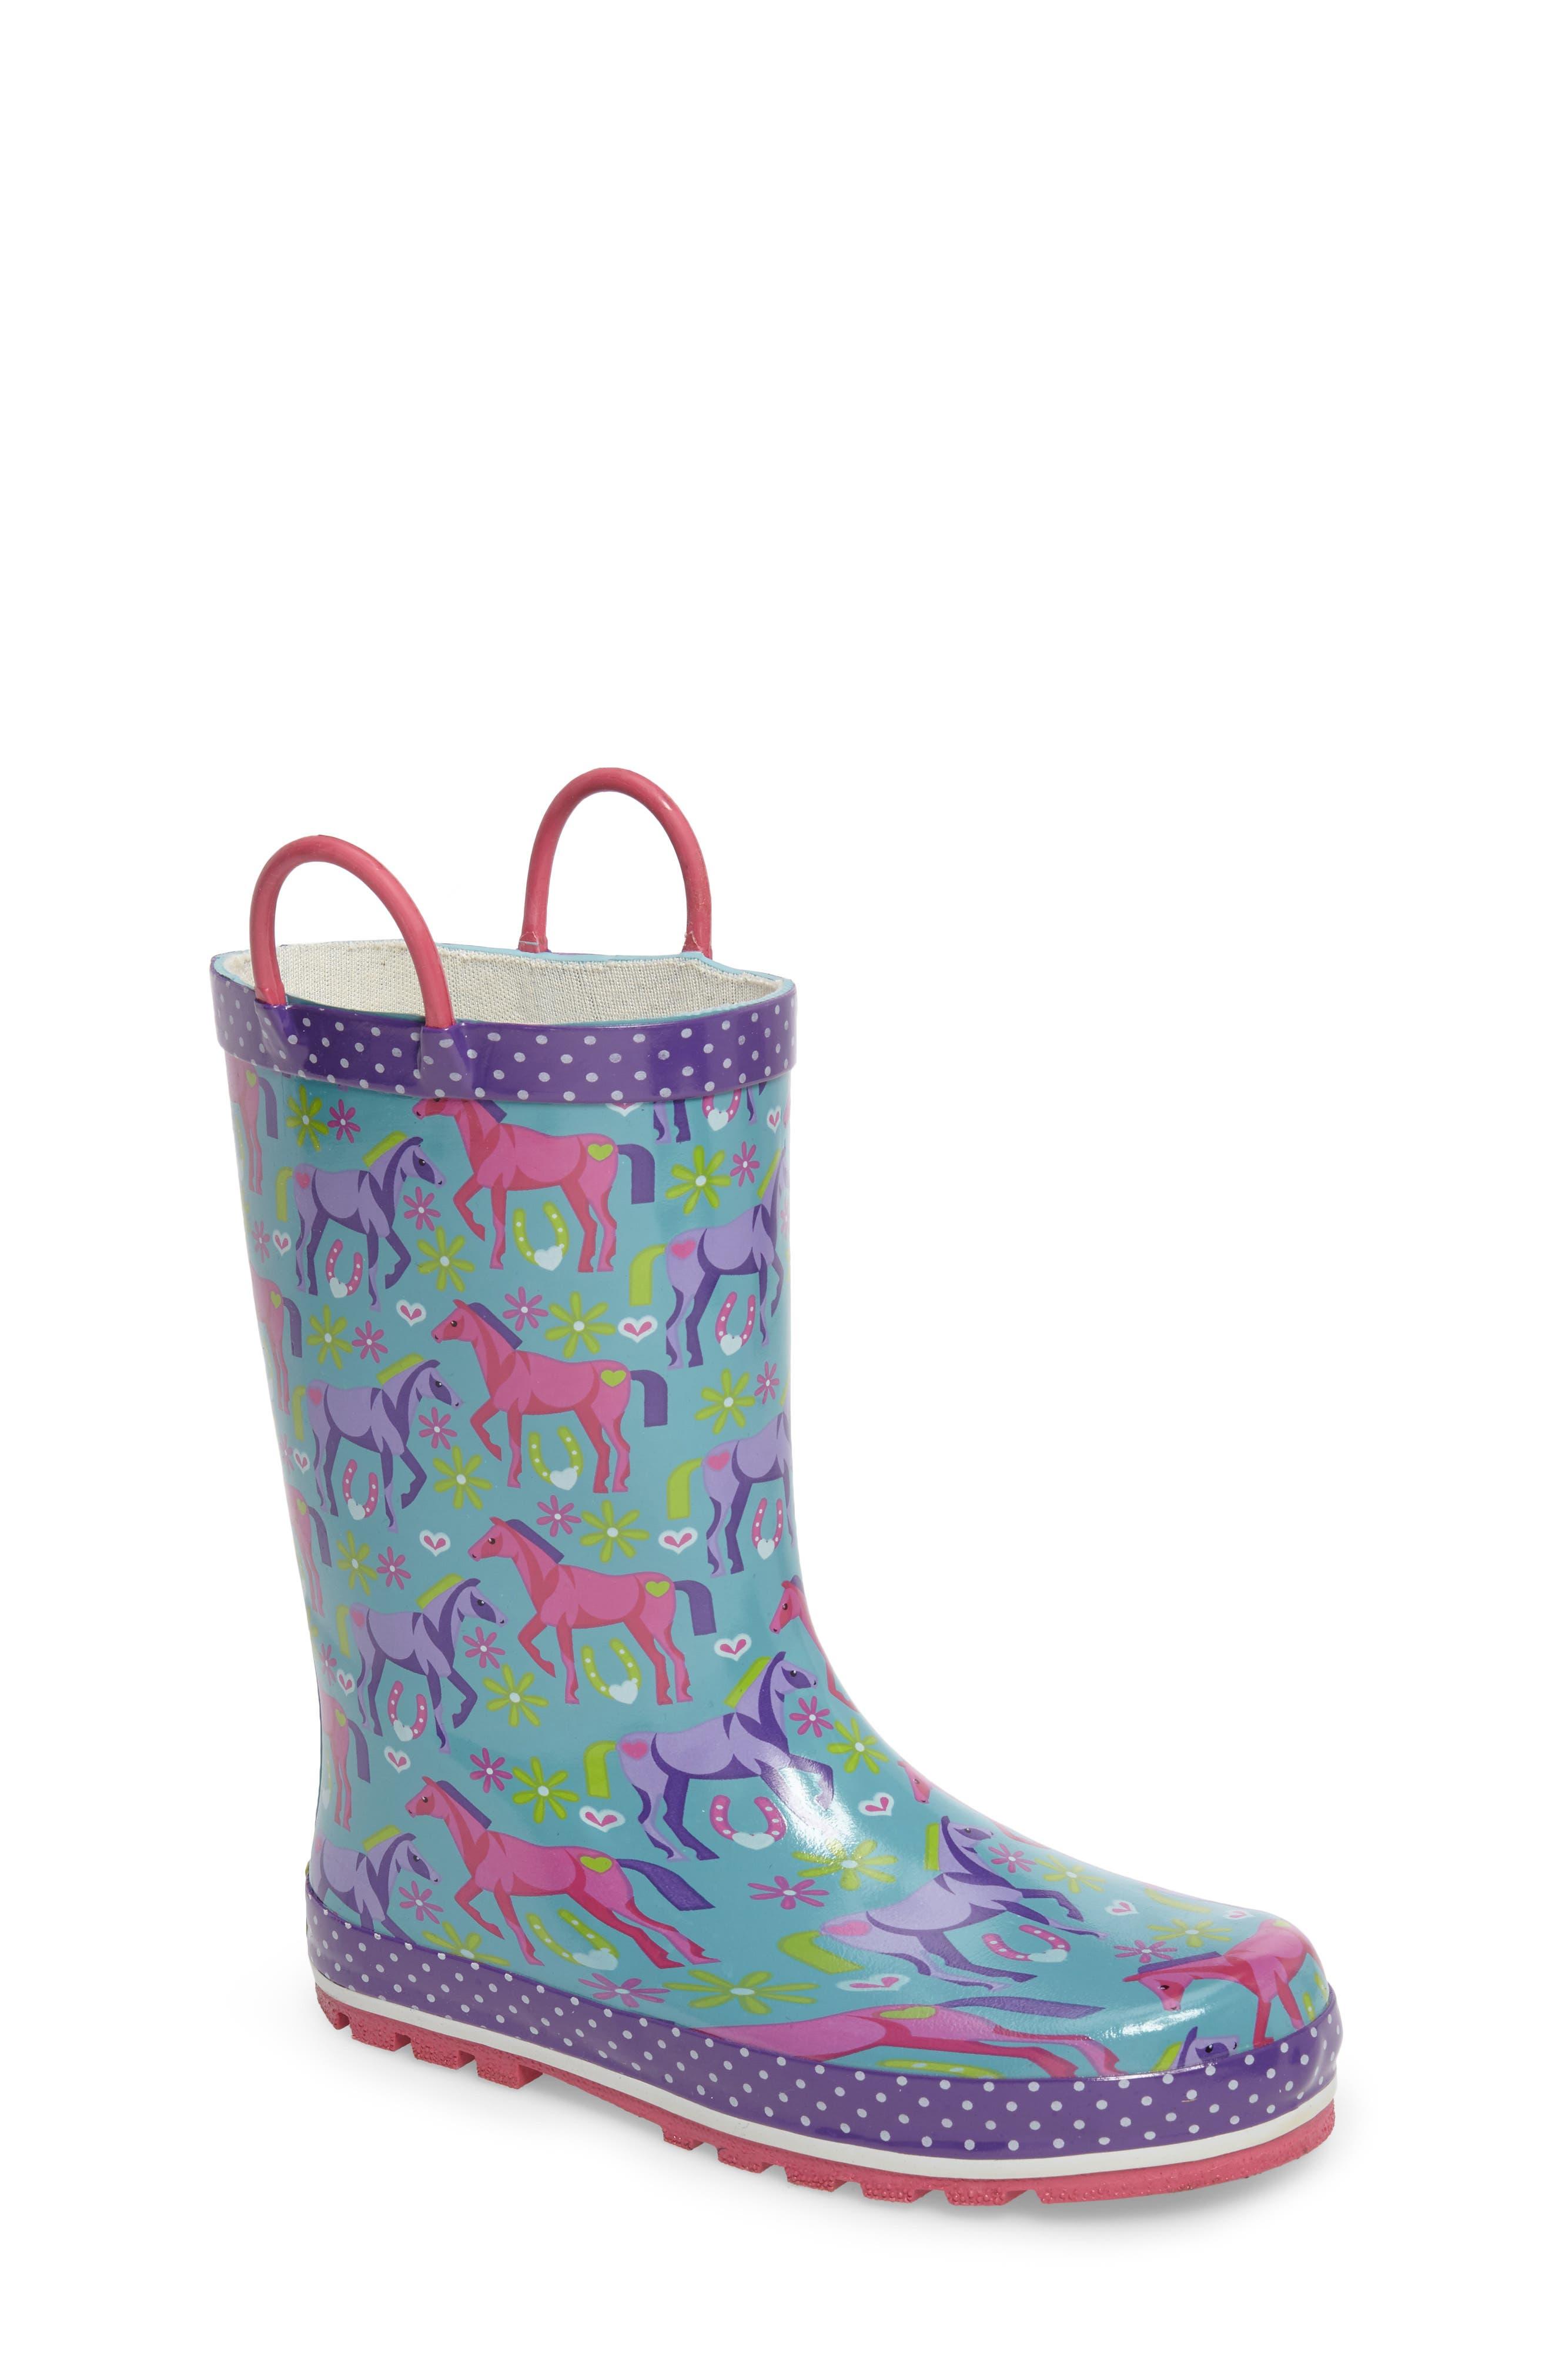 Alternate Image 1 Selected - Western Chief Hannah Horse Rain Boot (Toddler, Little Kid & Big Kid)